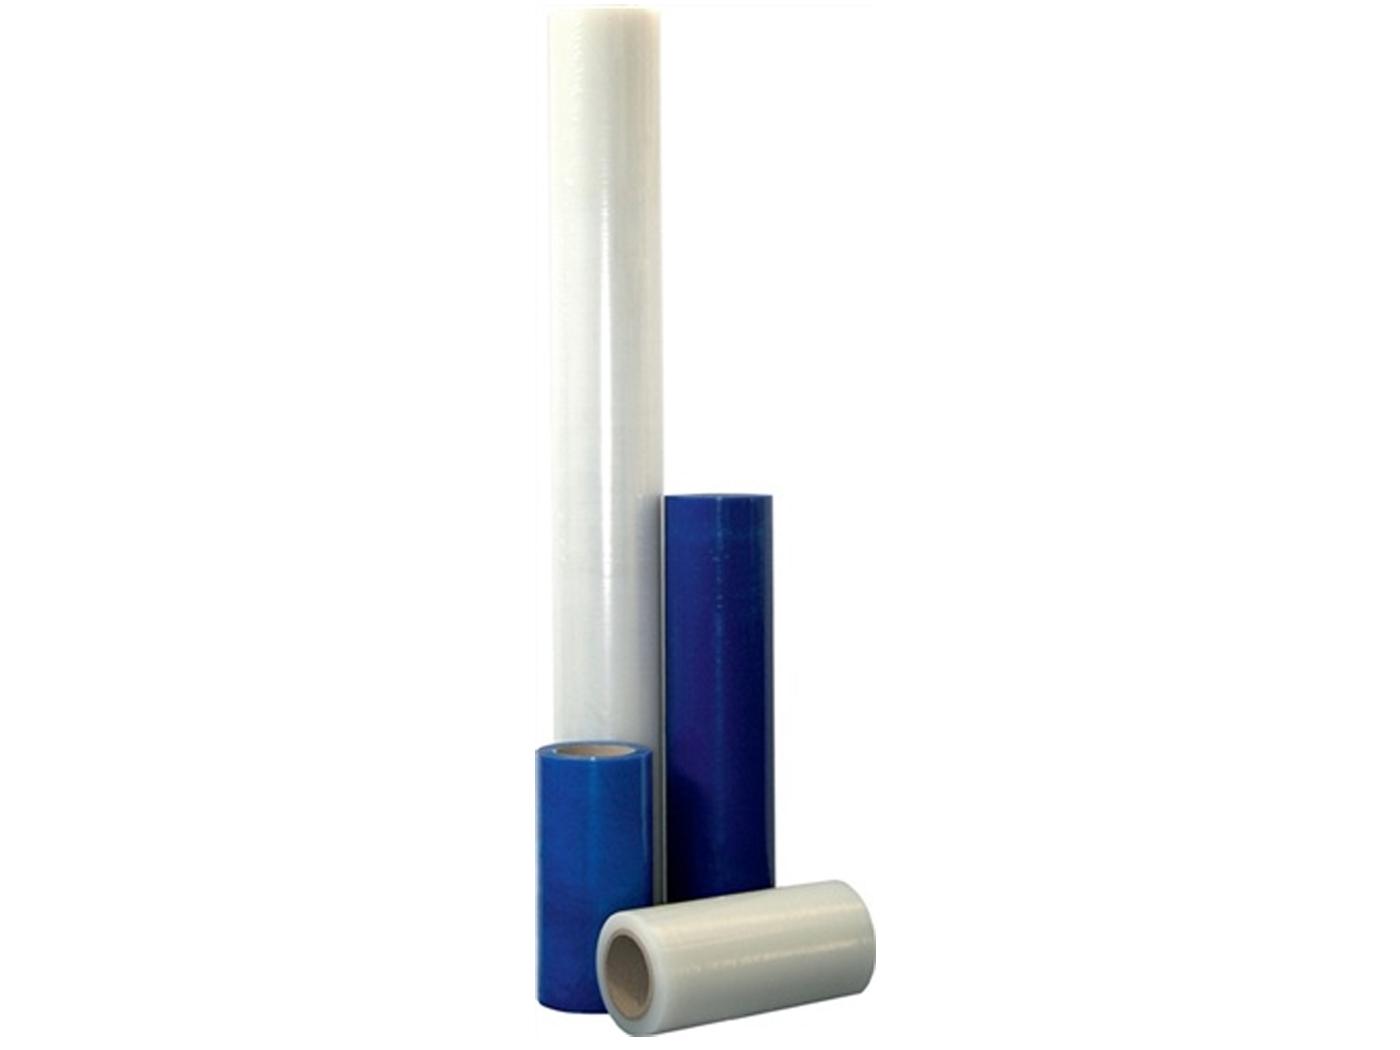 Beschermfolie voor glas blauw transparant   DKMTools - DKM Tools